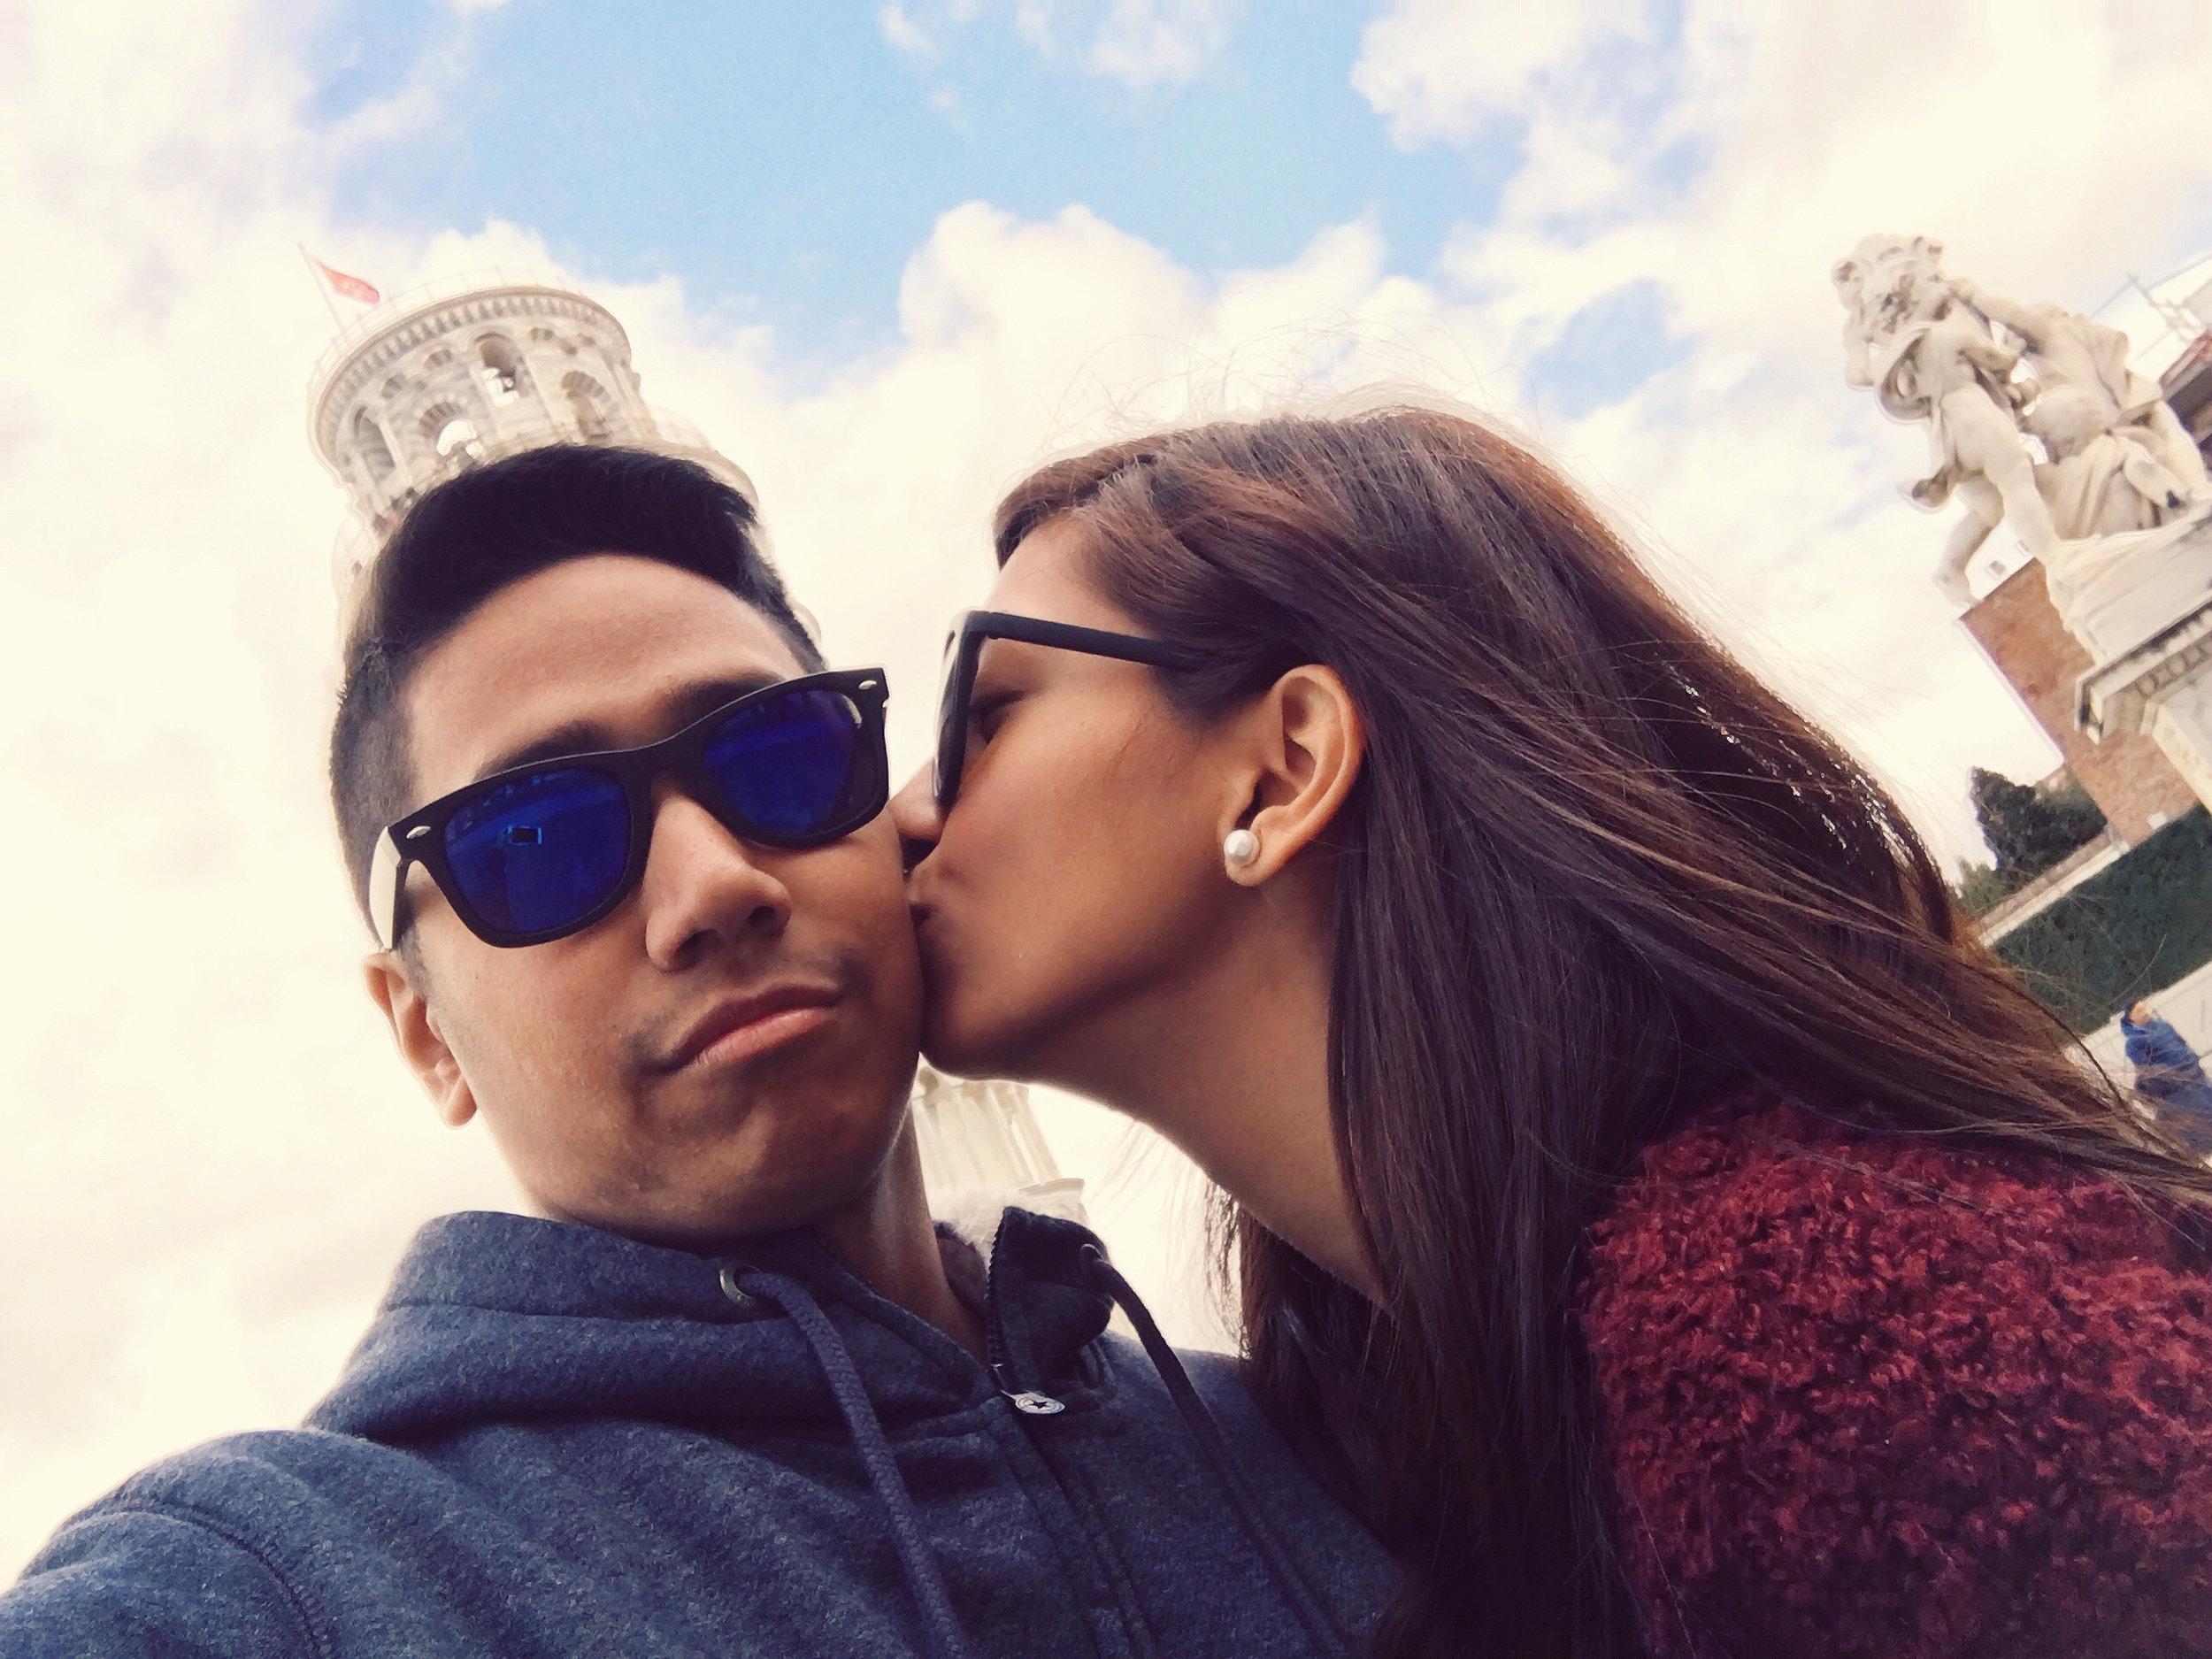 vergs-roxci-kiss-couple.JPG